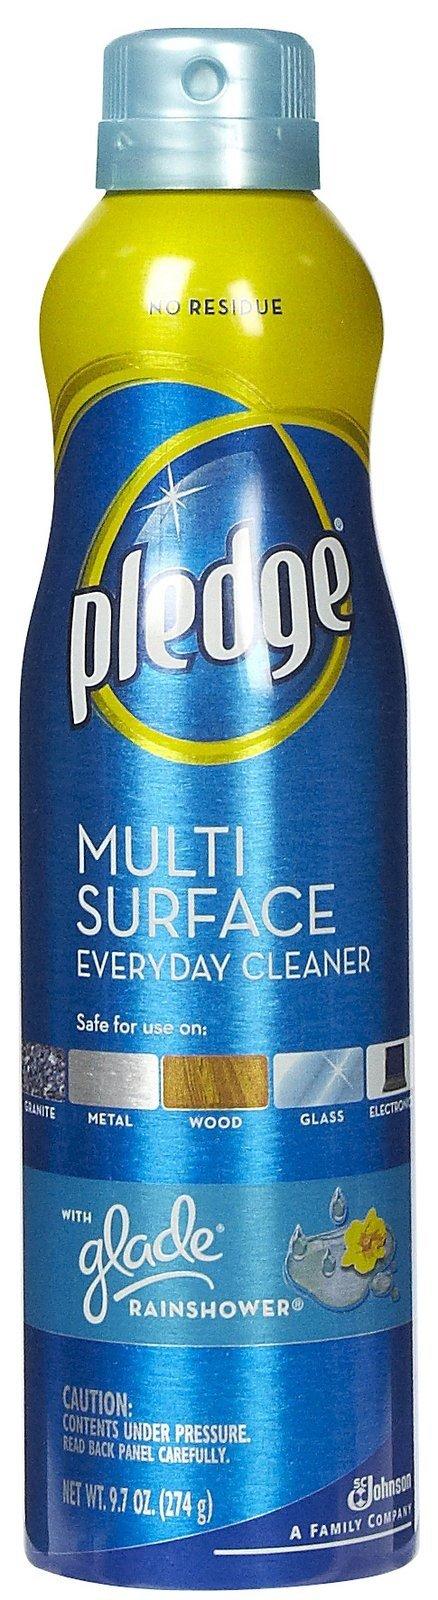 Pledge Multi-Surface Everyday Aerosol, Rainshower, Pack of 18 by Pledge